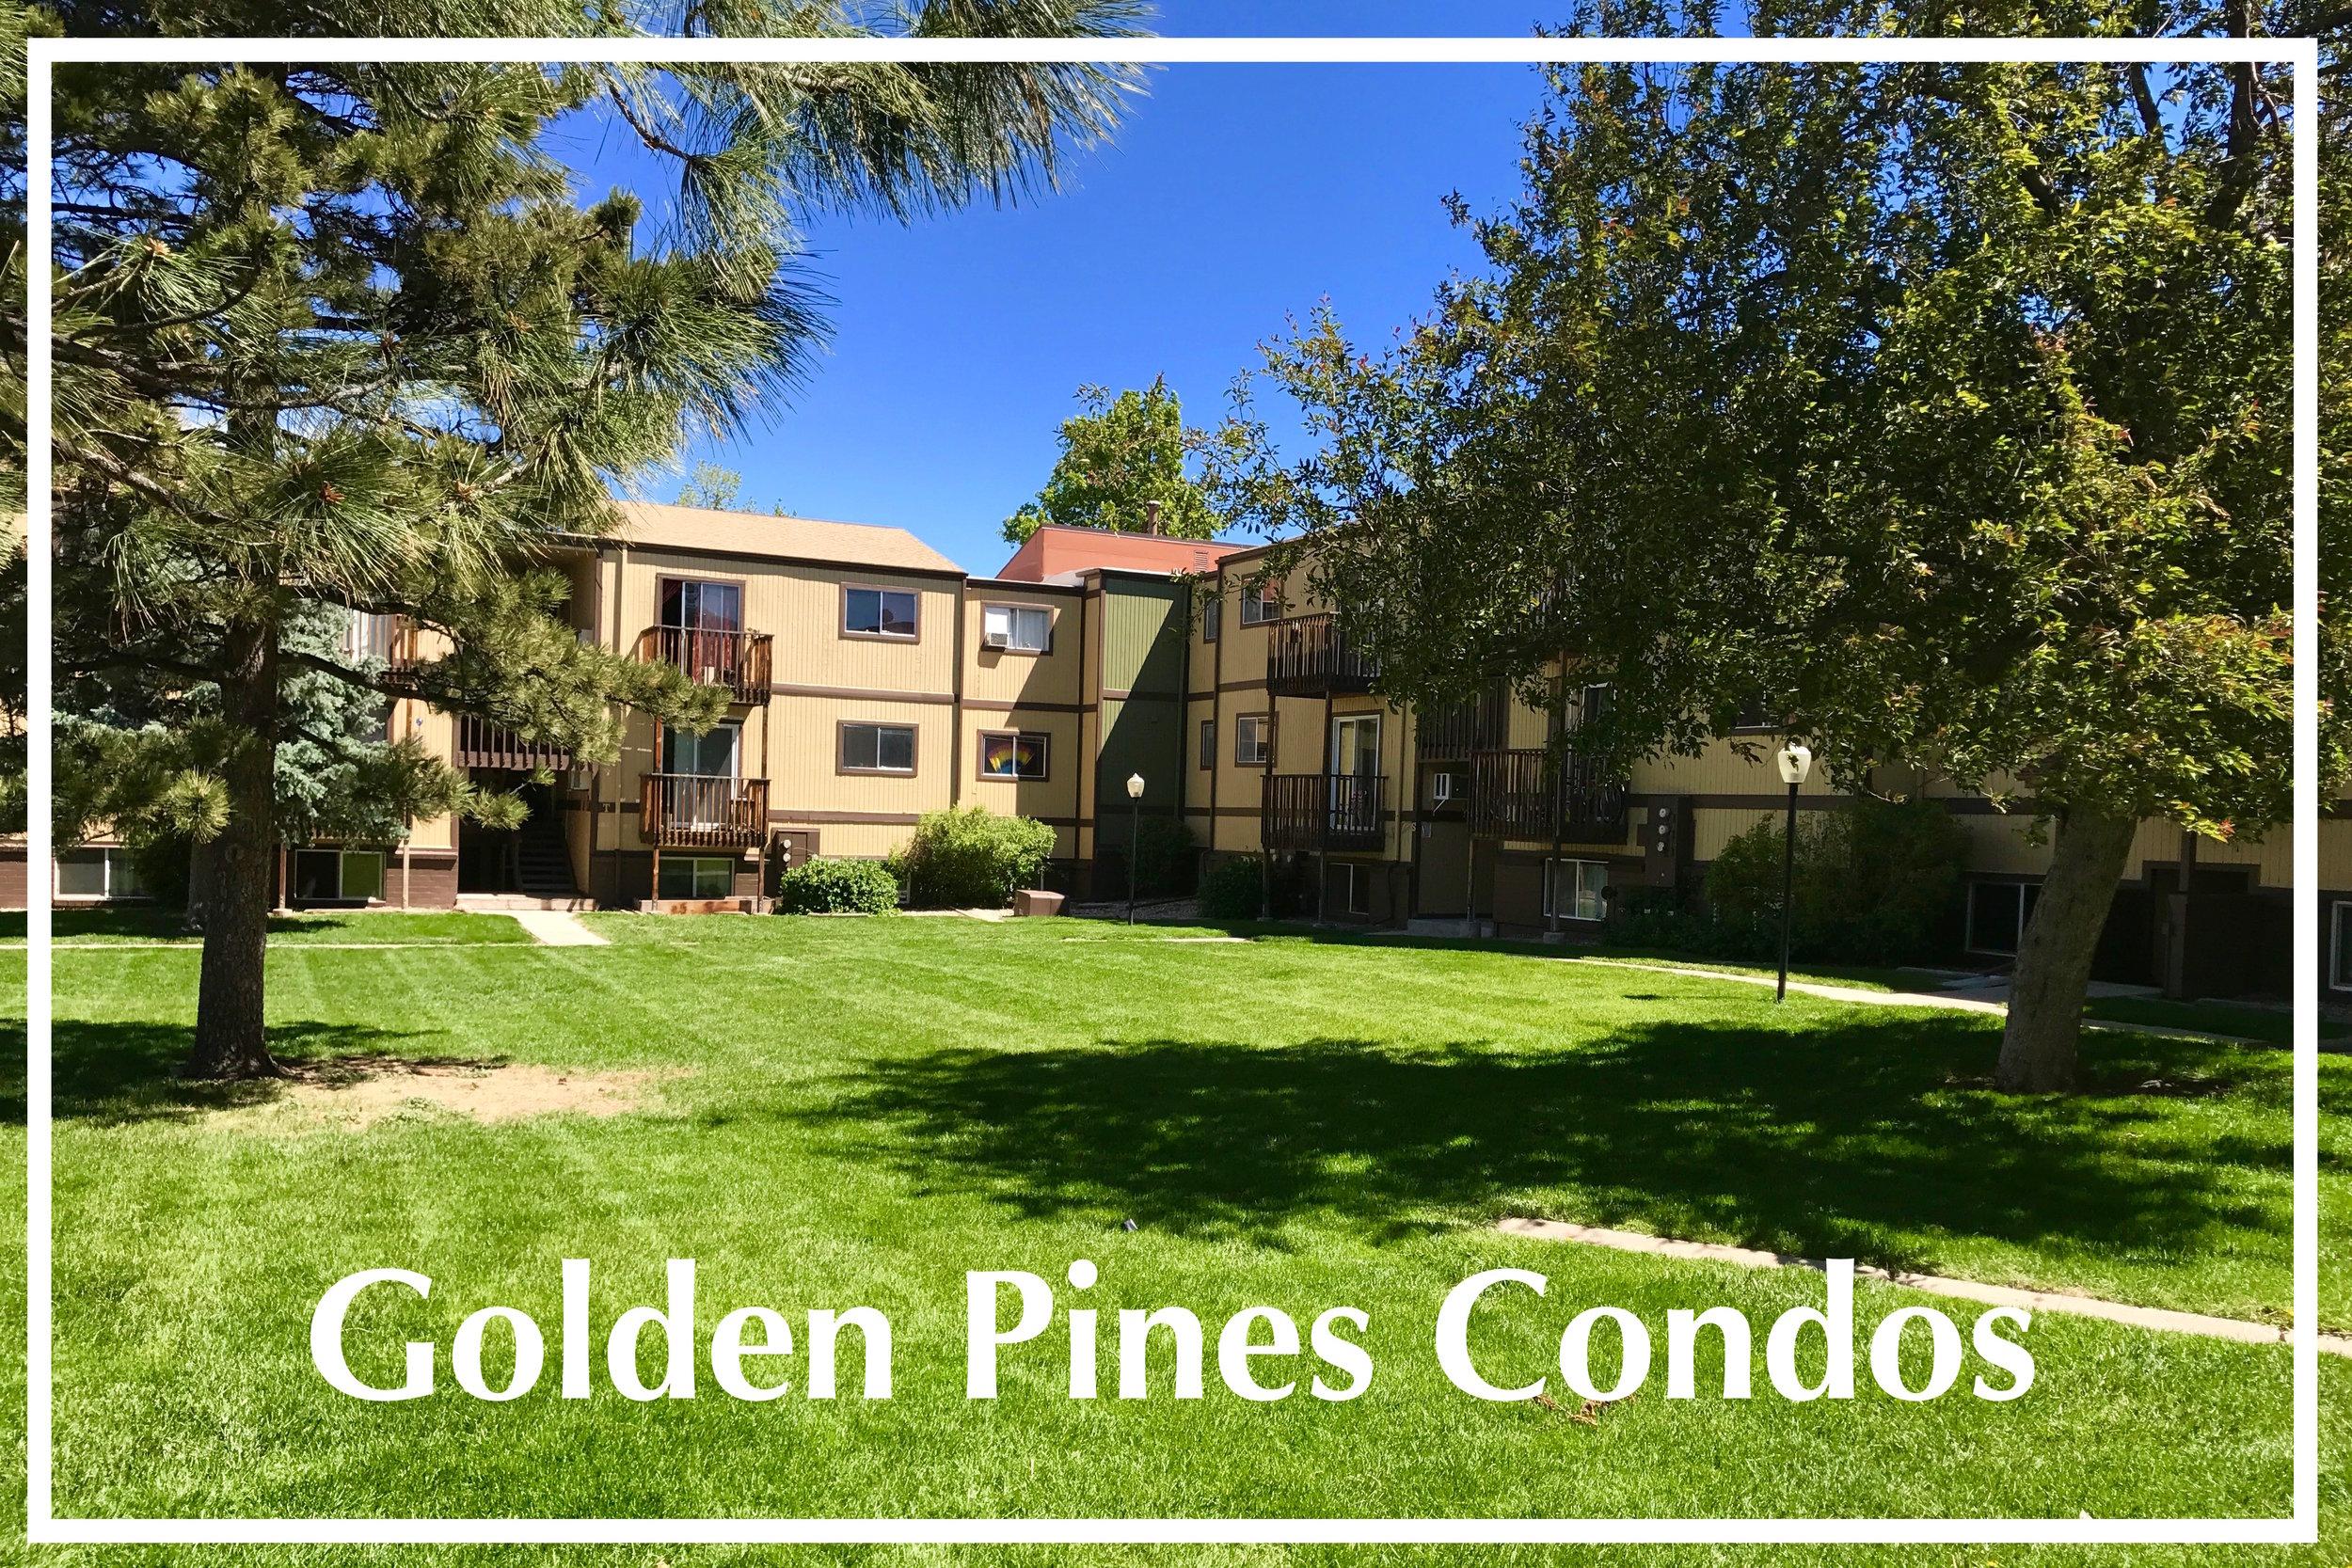 Golden Pines Condos.jpg